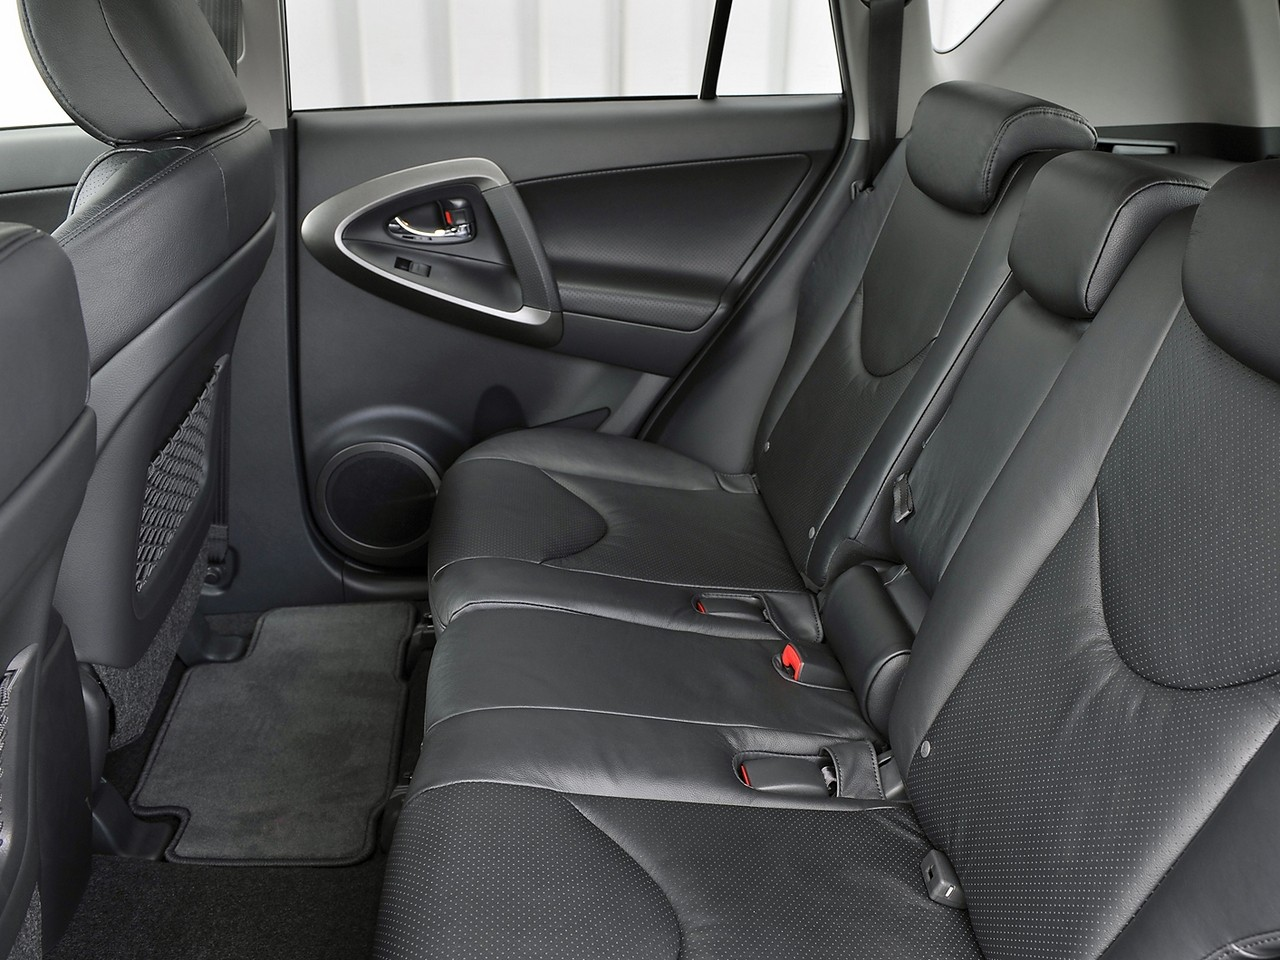 Toyota Rav4 5 Doors Specs 2008 2009 2010 Autoevolution